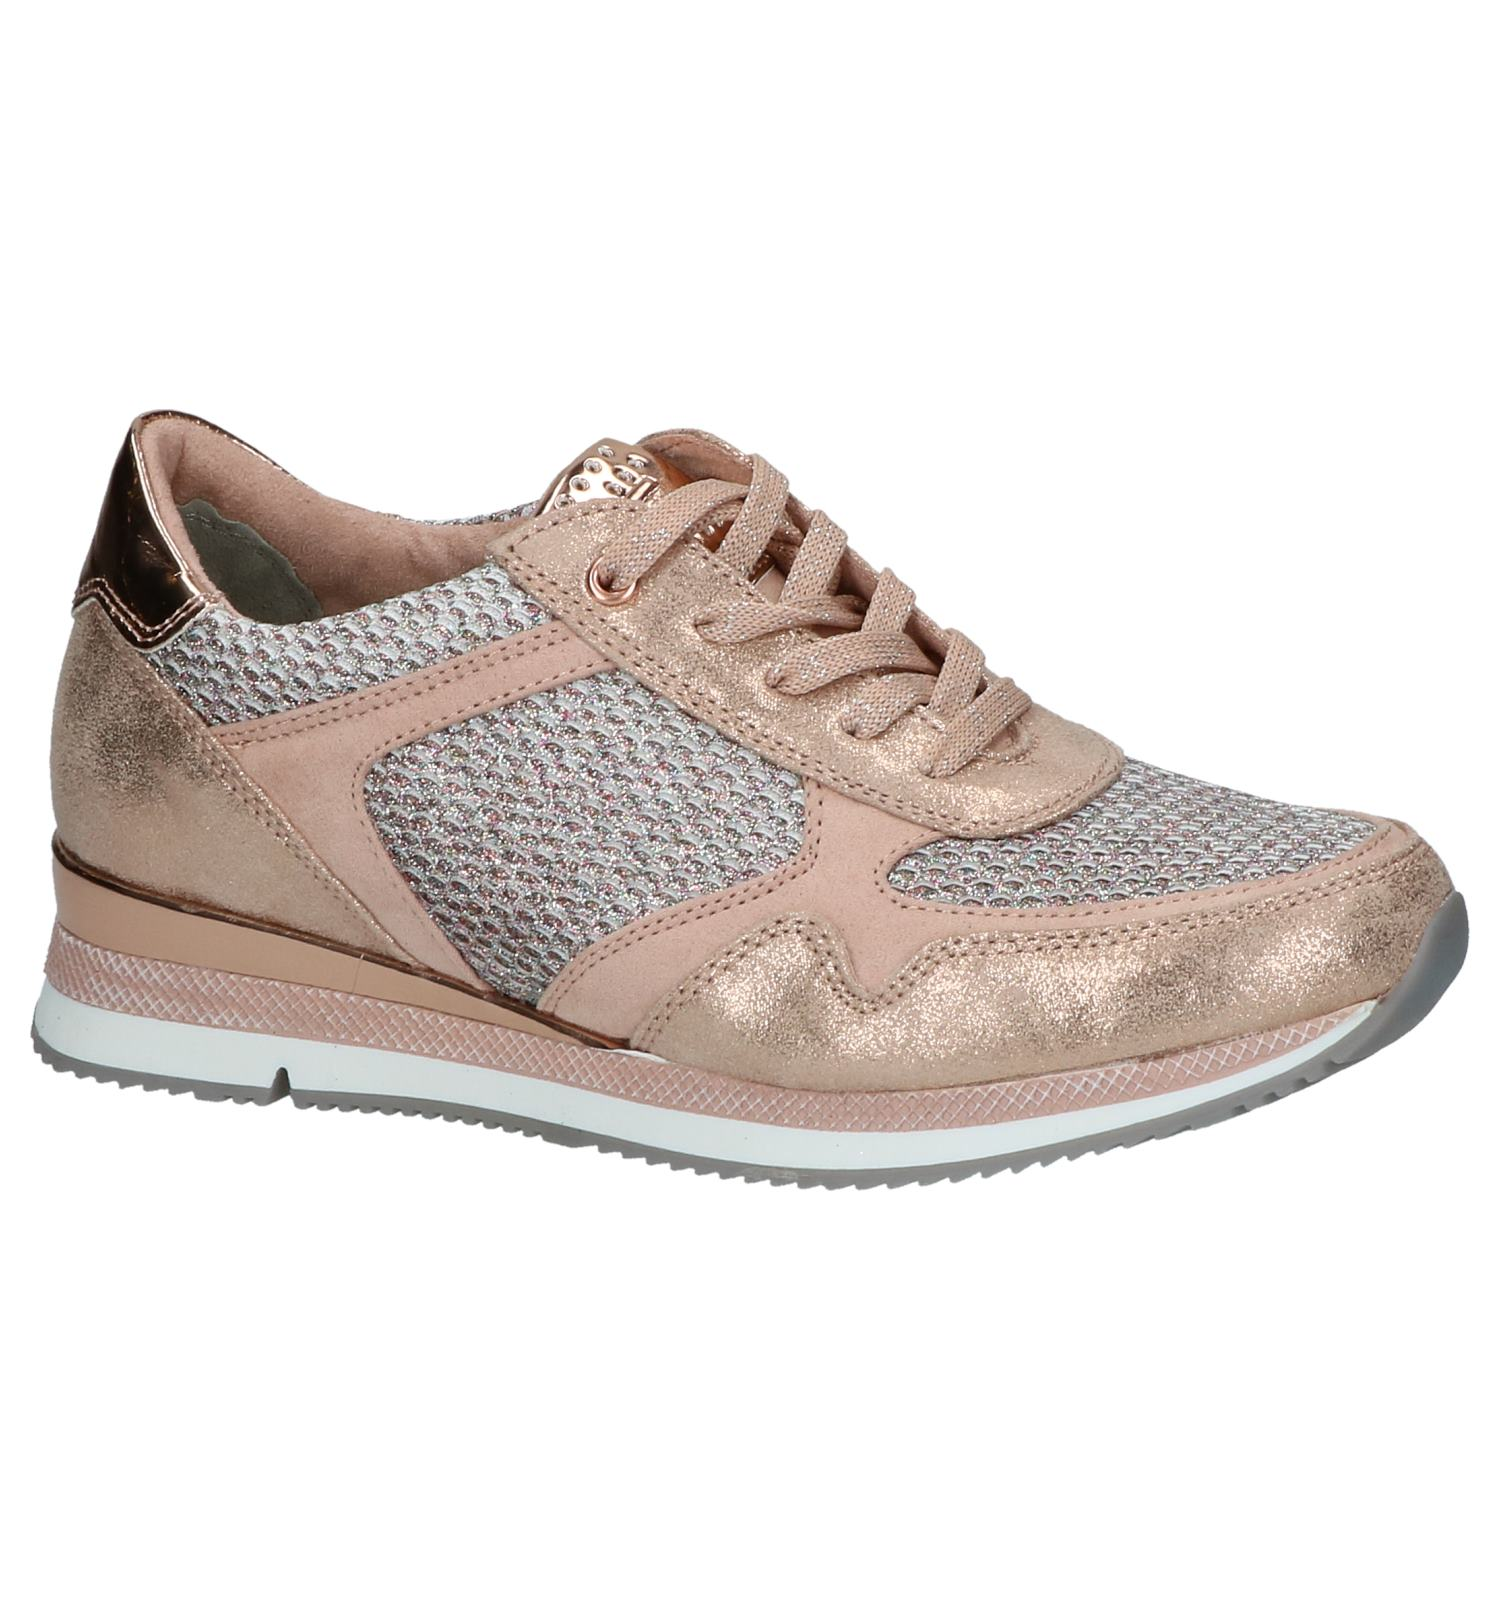 official photos 287fb fbf68 Rose Gold Sneakers met Glitters Marco Tozzi | TORFS.BE | Gratis verzend en  retour